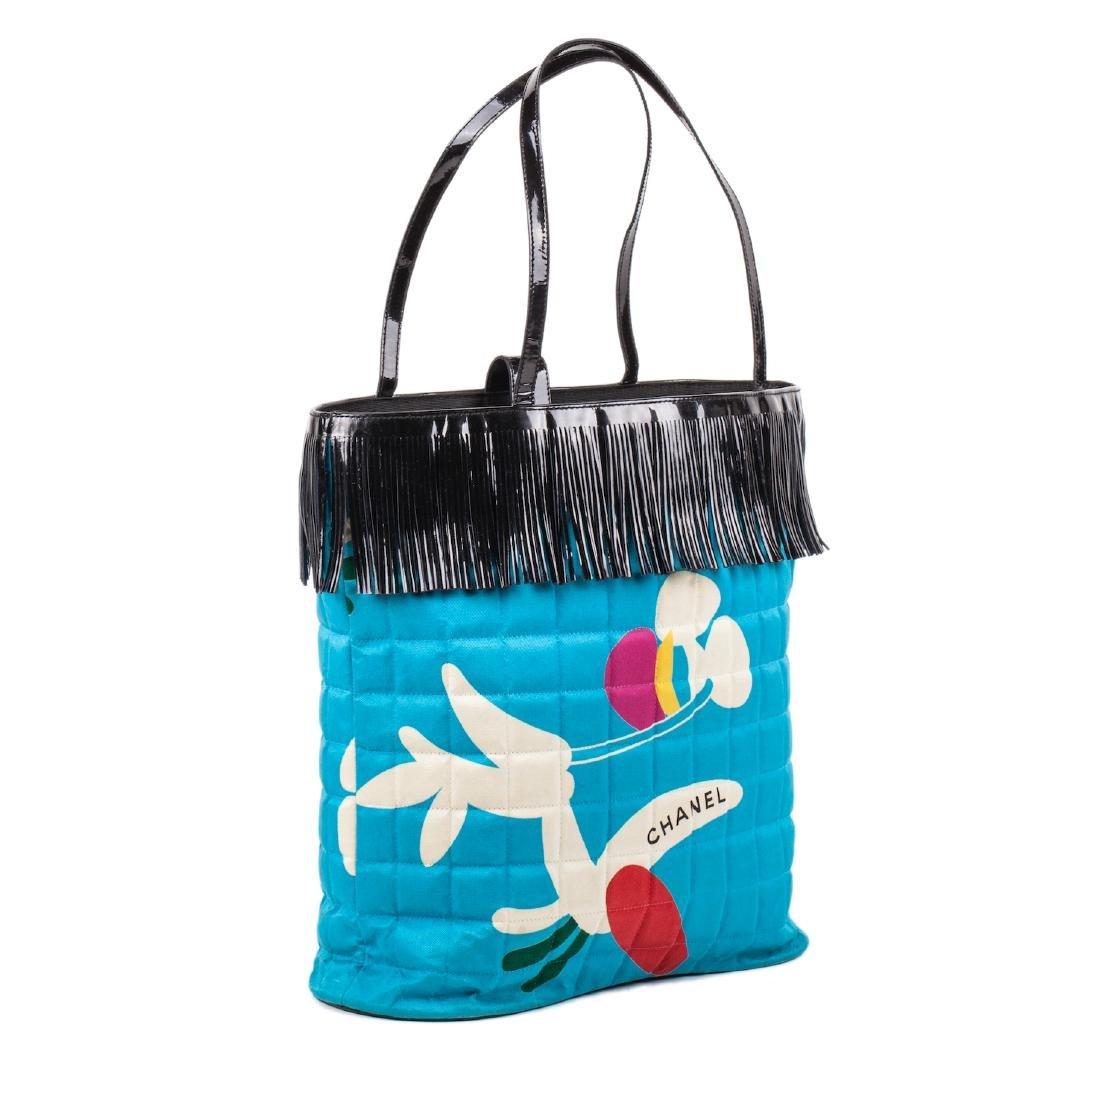 Chanel silk bag